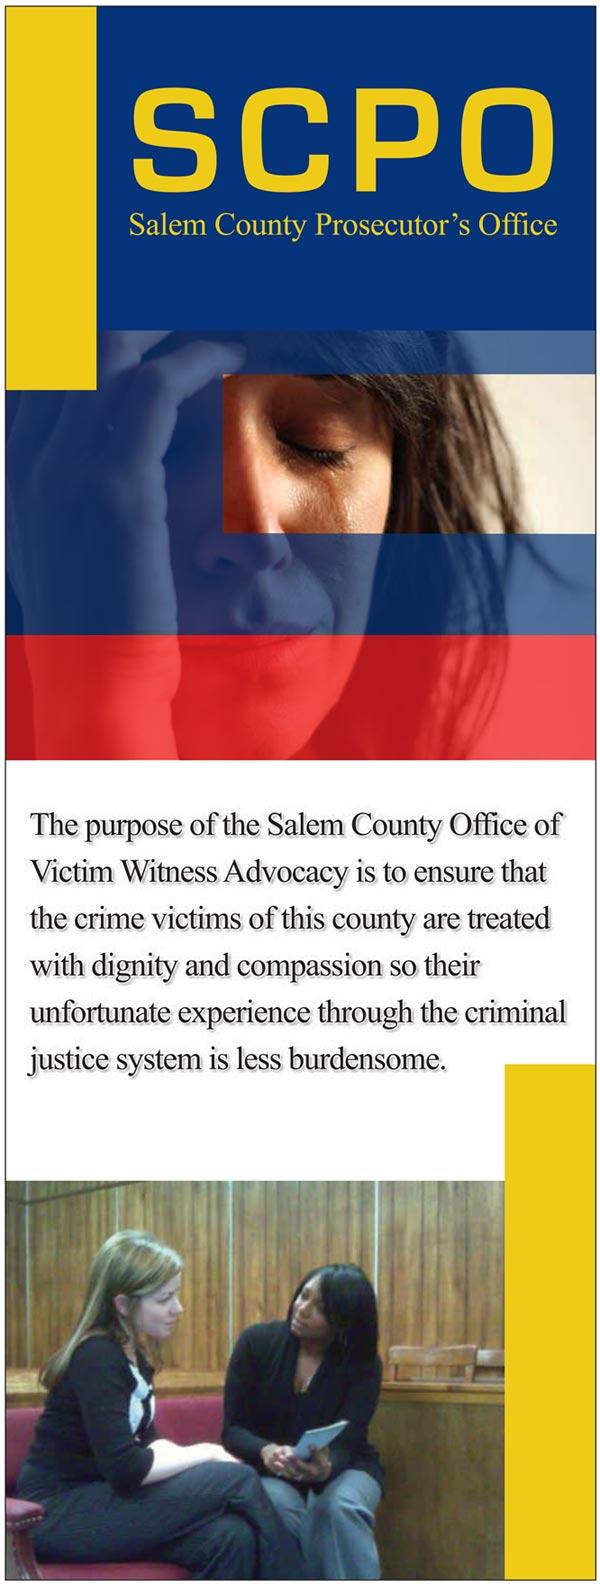 BannerVW600 - Victim / Witness